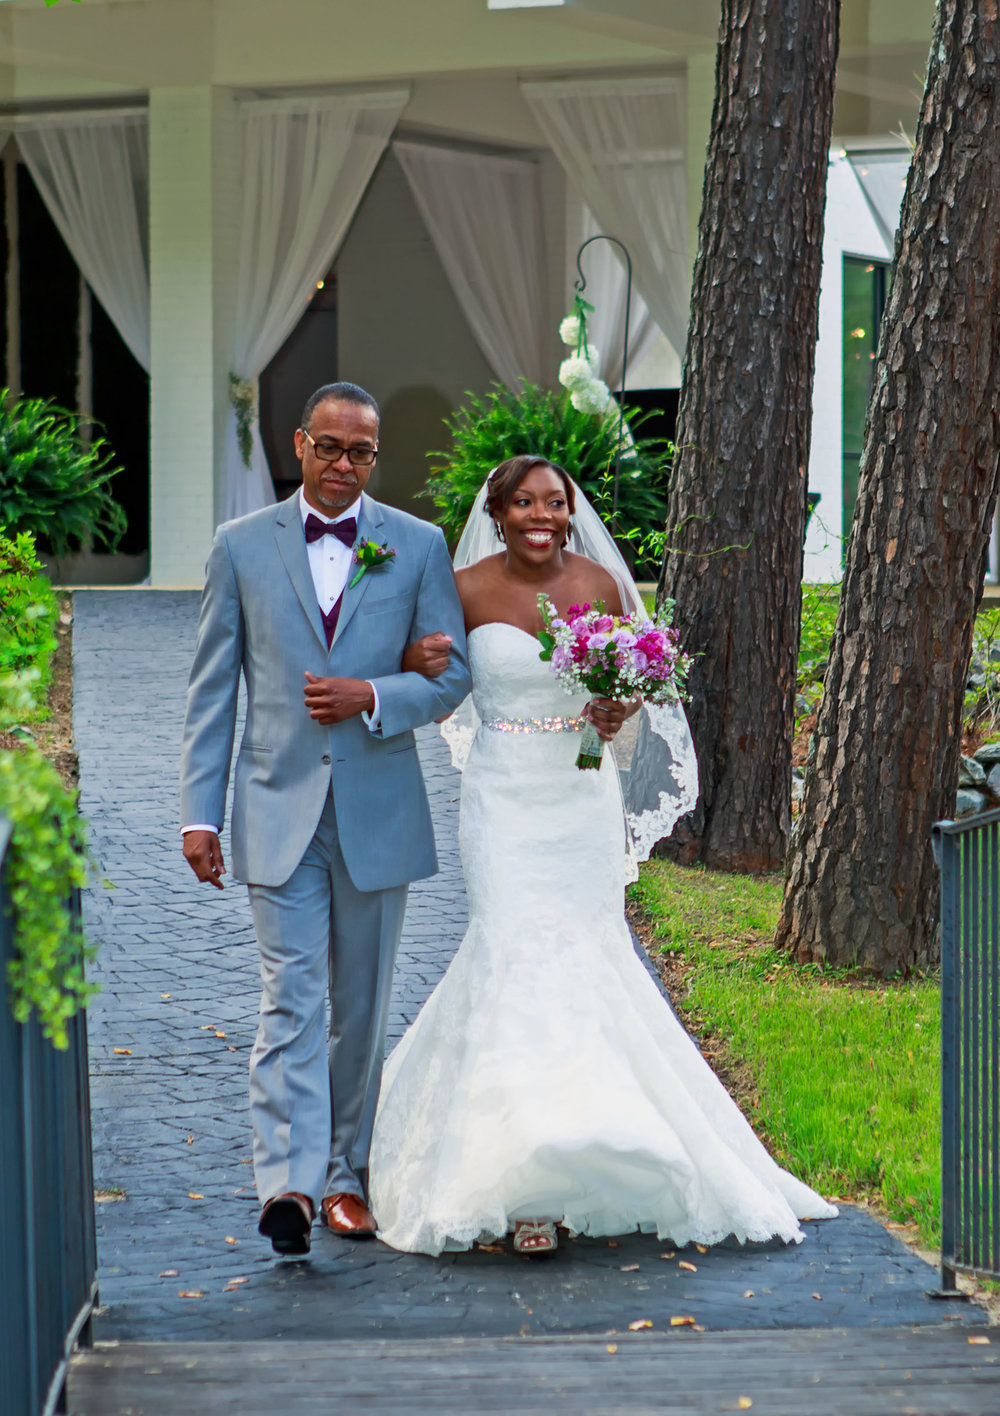 NC-Wedding-Vizcaya-Villa-Fayetteville-Ceremony-30.jpg